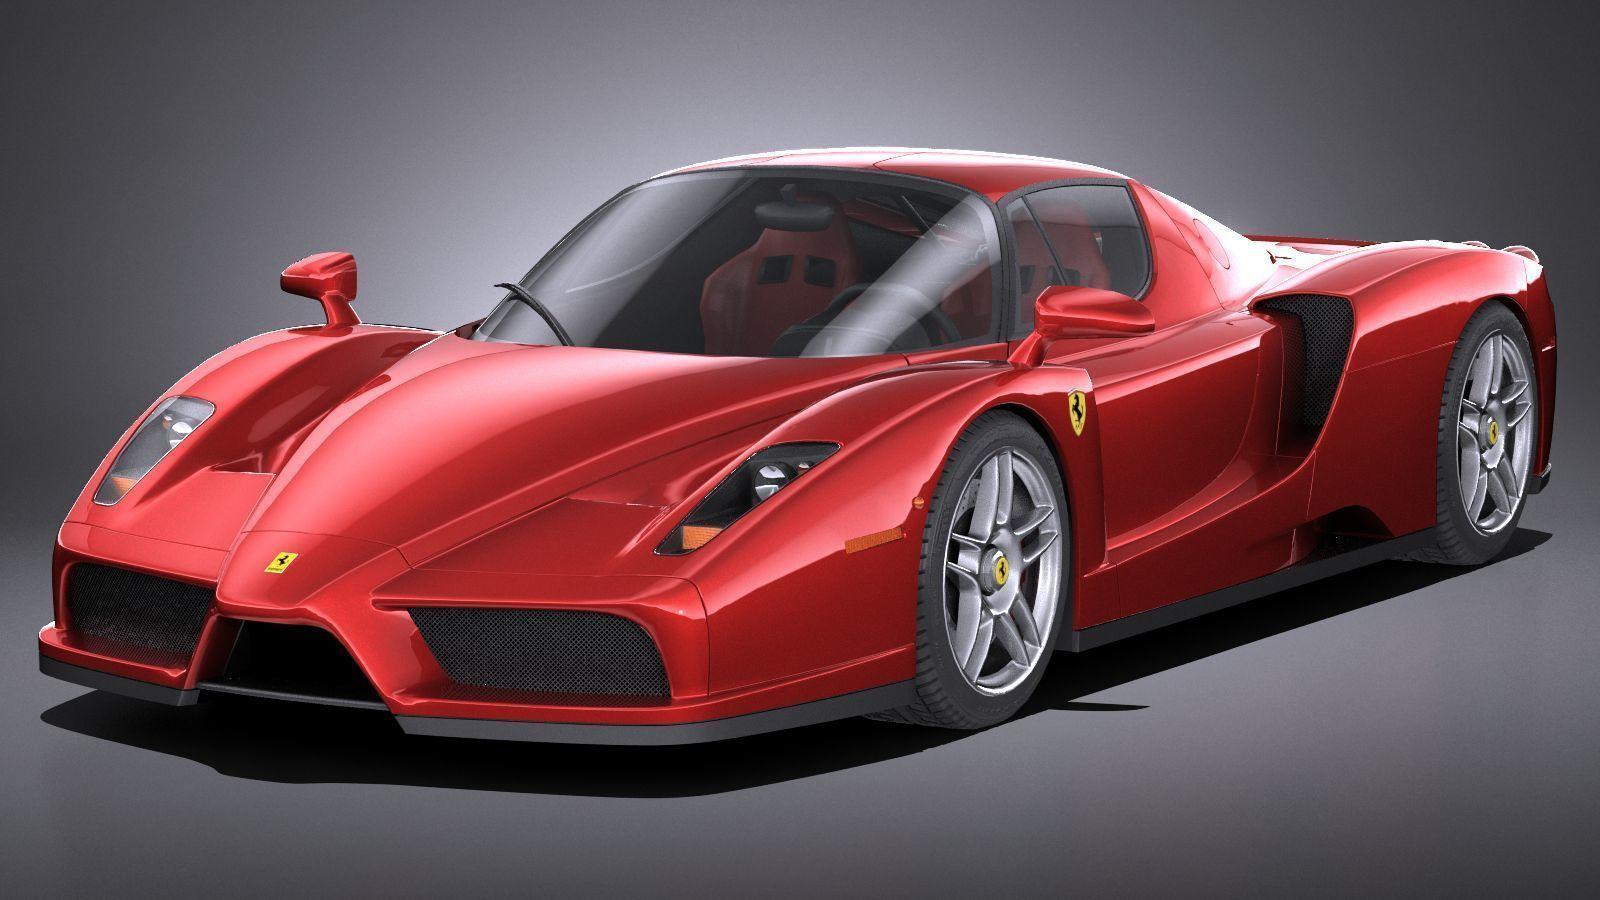 3d Model Hq Lowpoly Ferrari Enzo F60 2002 Cgtrader